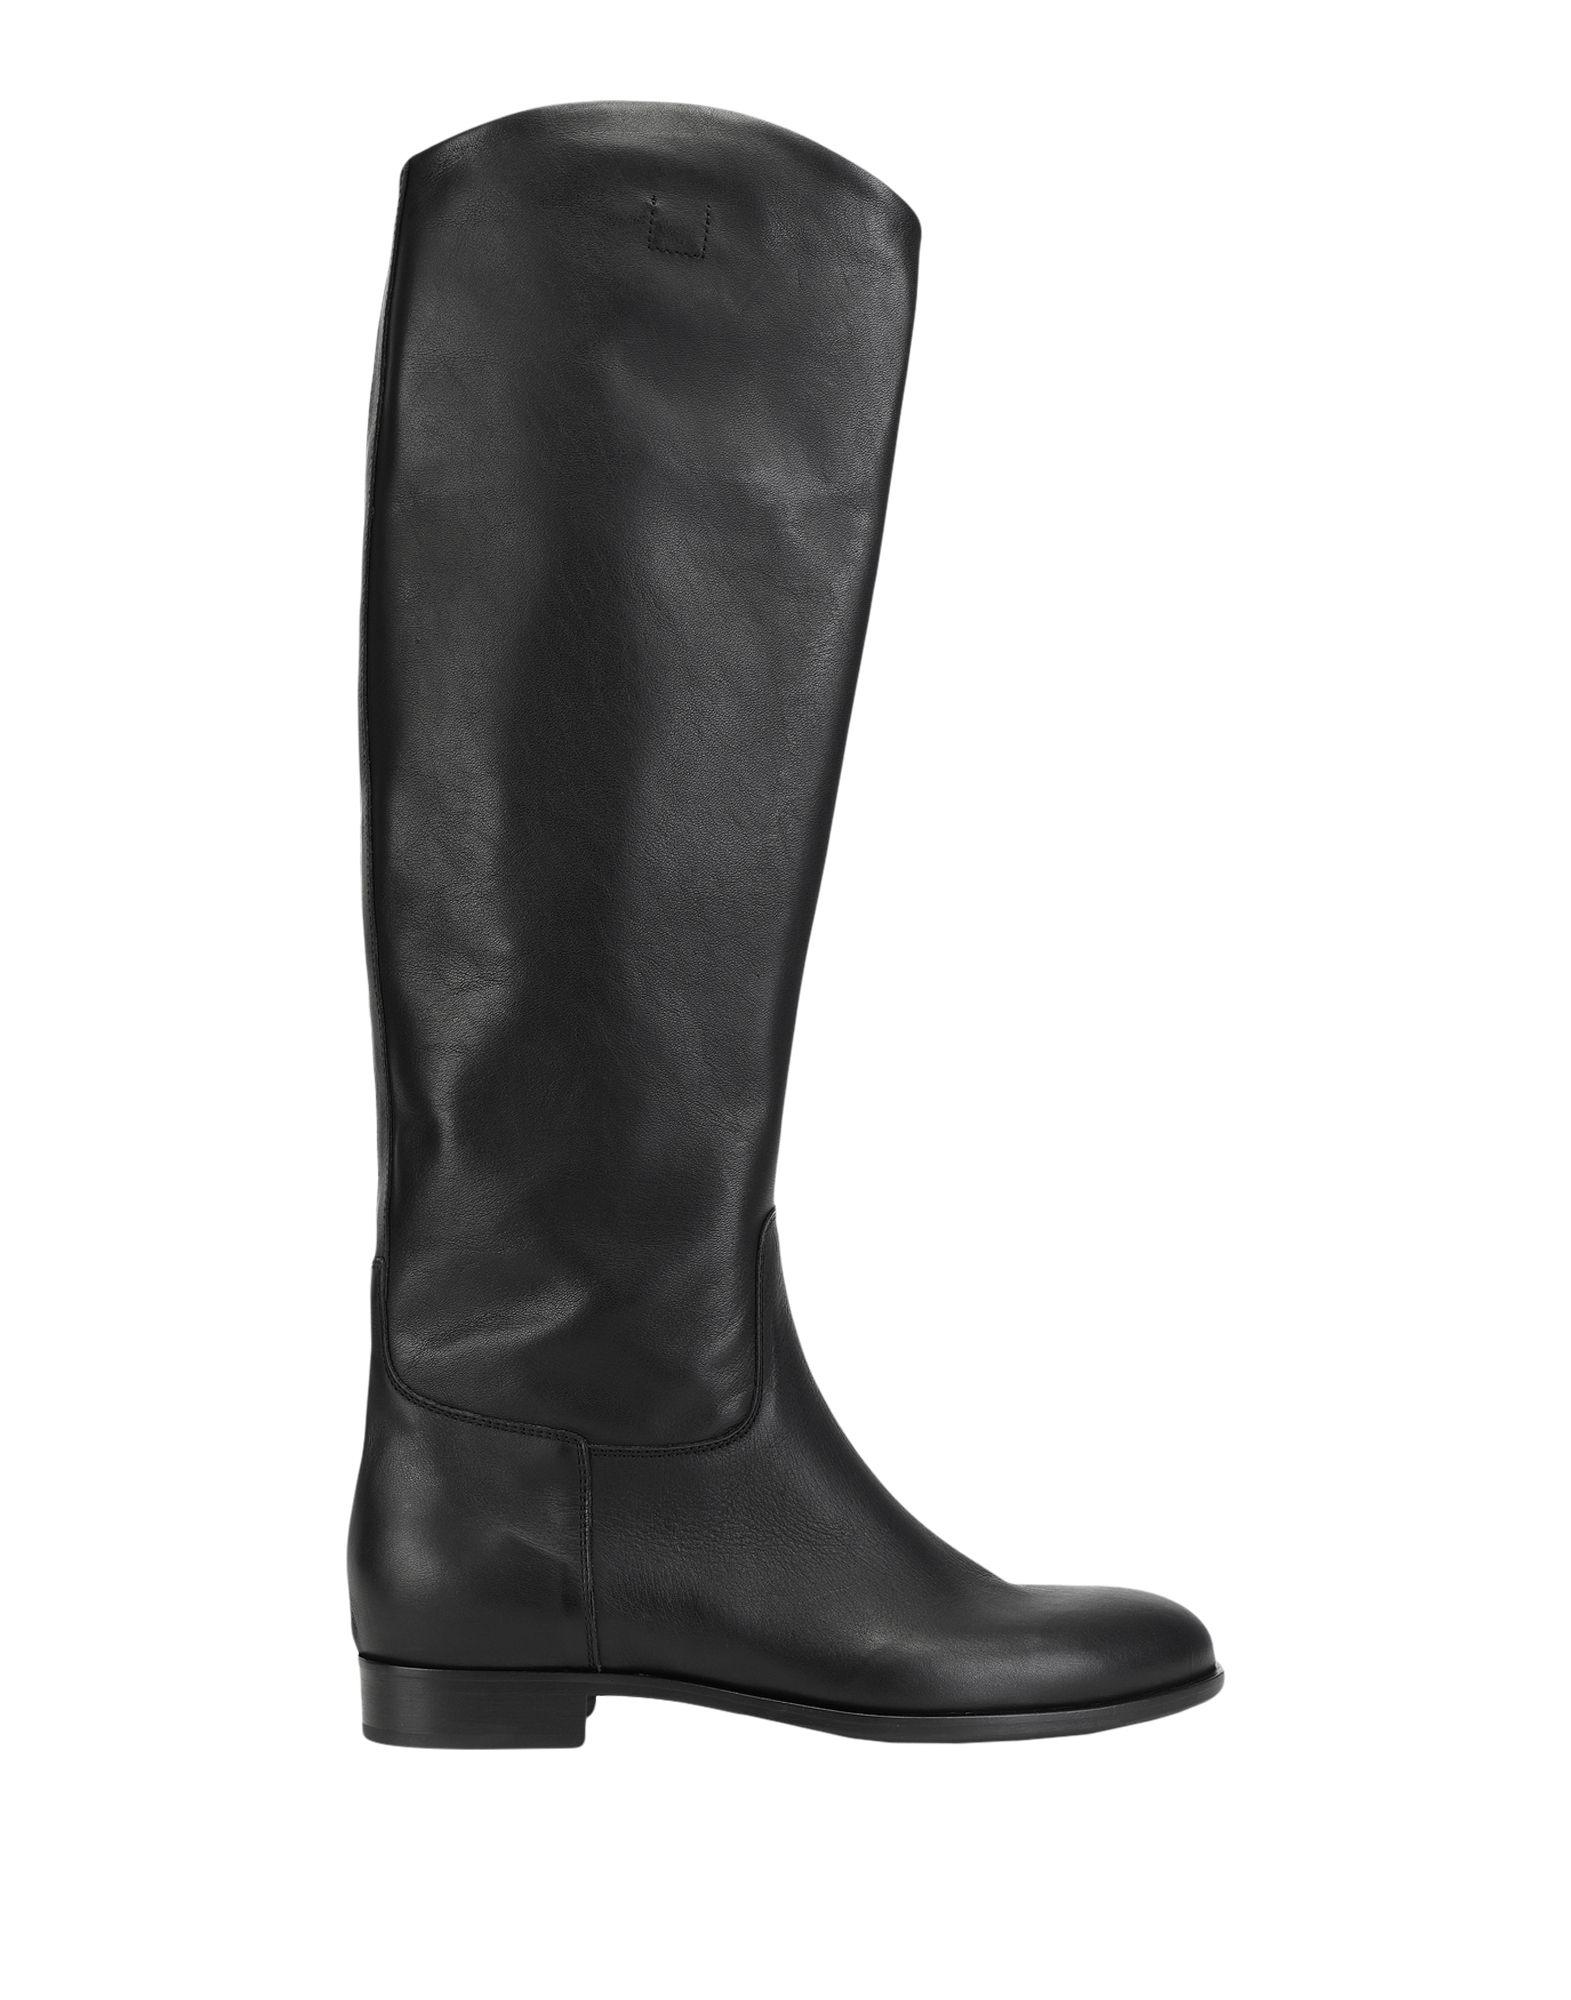 Leonardo Principi Stiefel Damen  11534323SMGut aussehende strapazierfähige Schuhe